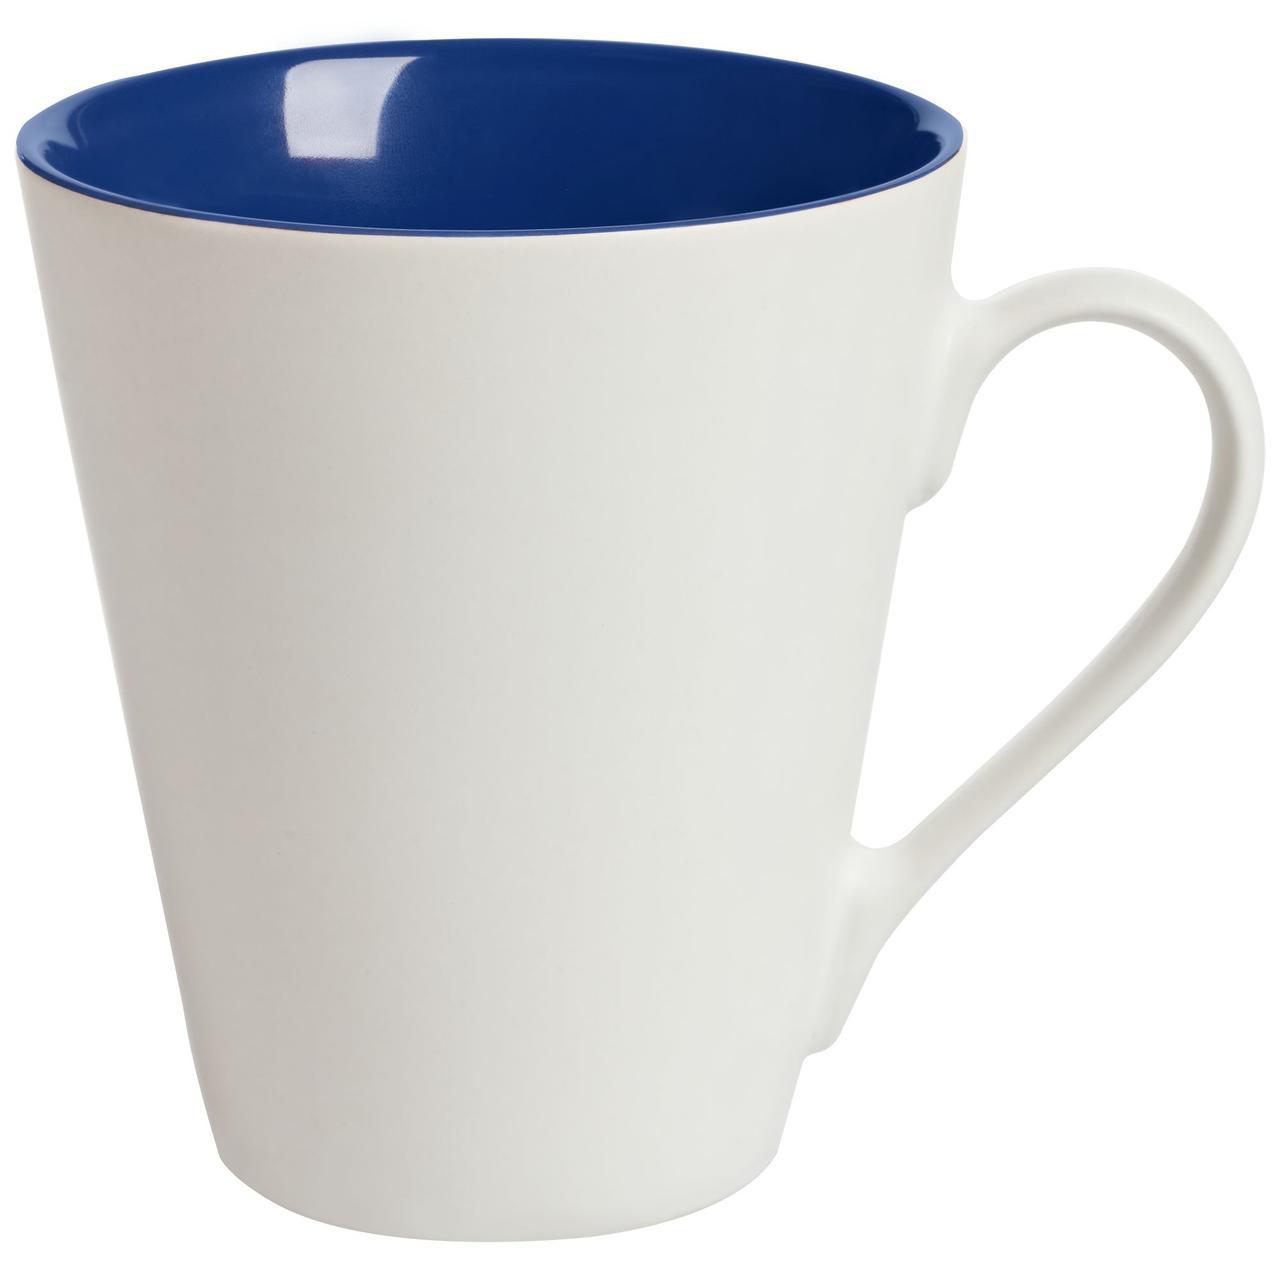 Кружка New Bell матовая, белая с синим (артикул 64811.40)